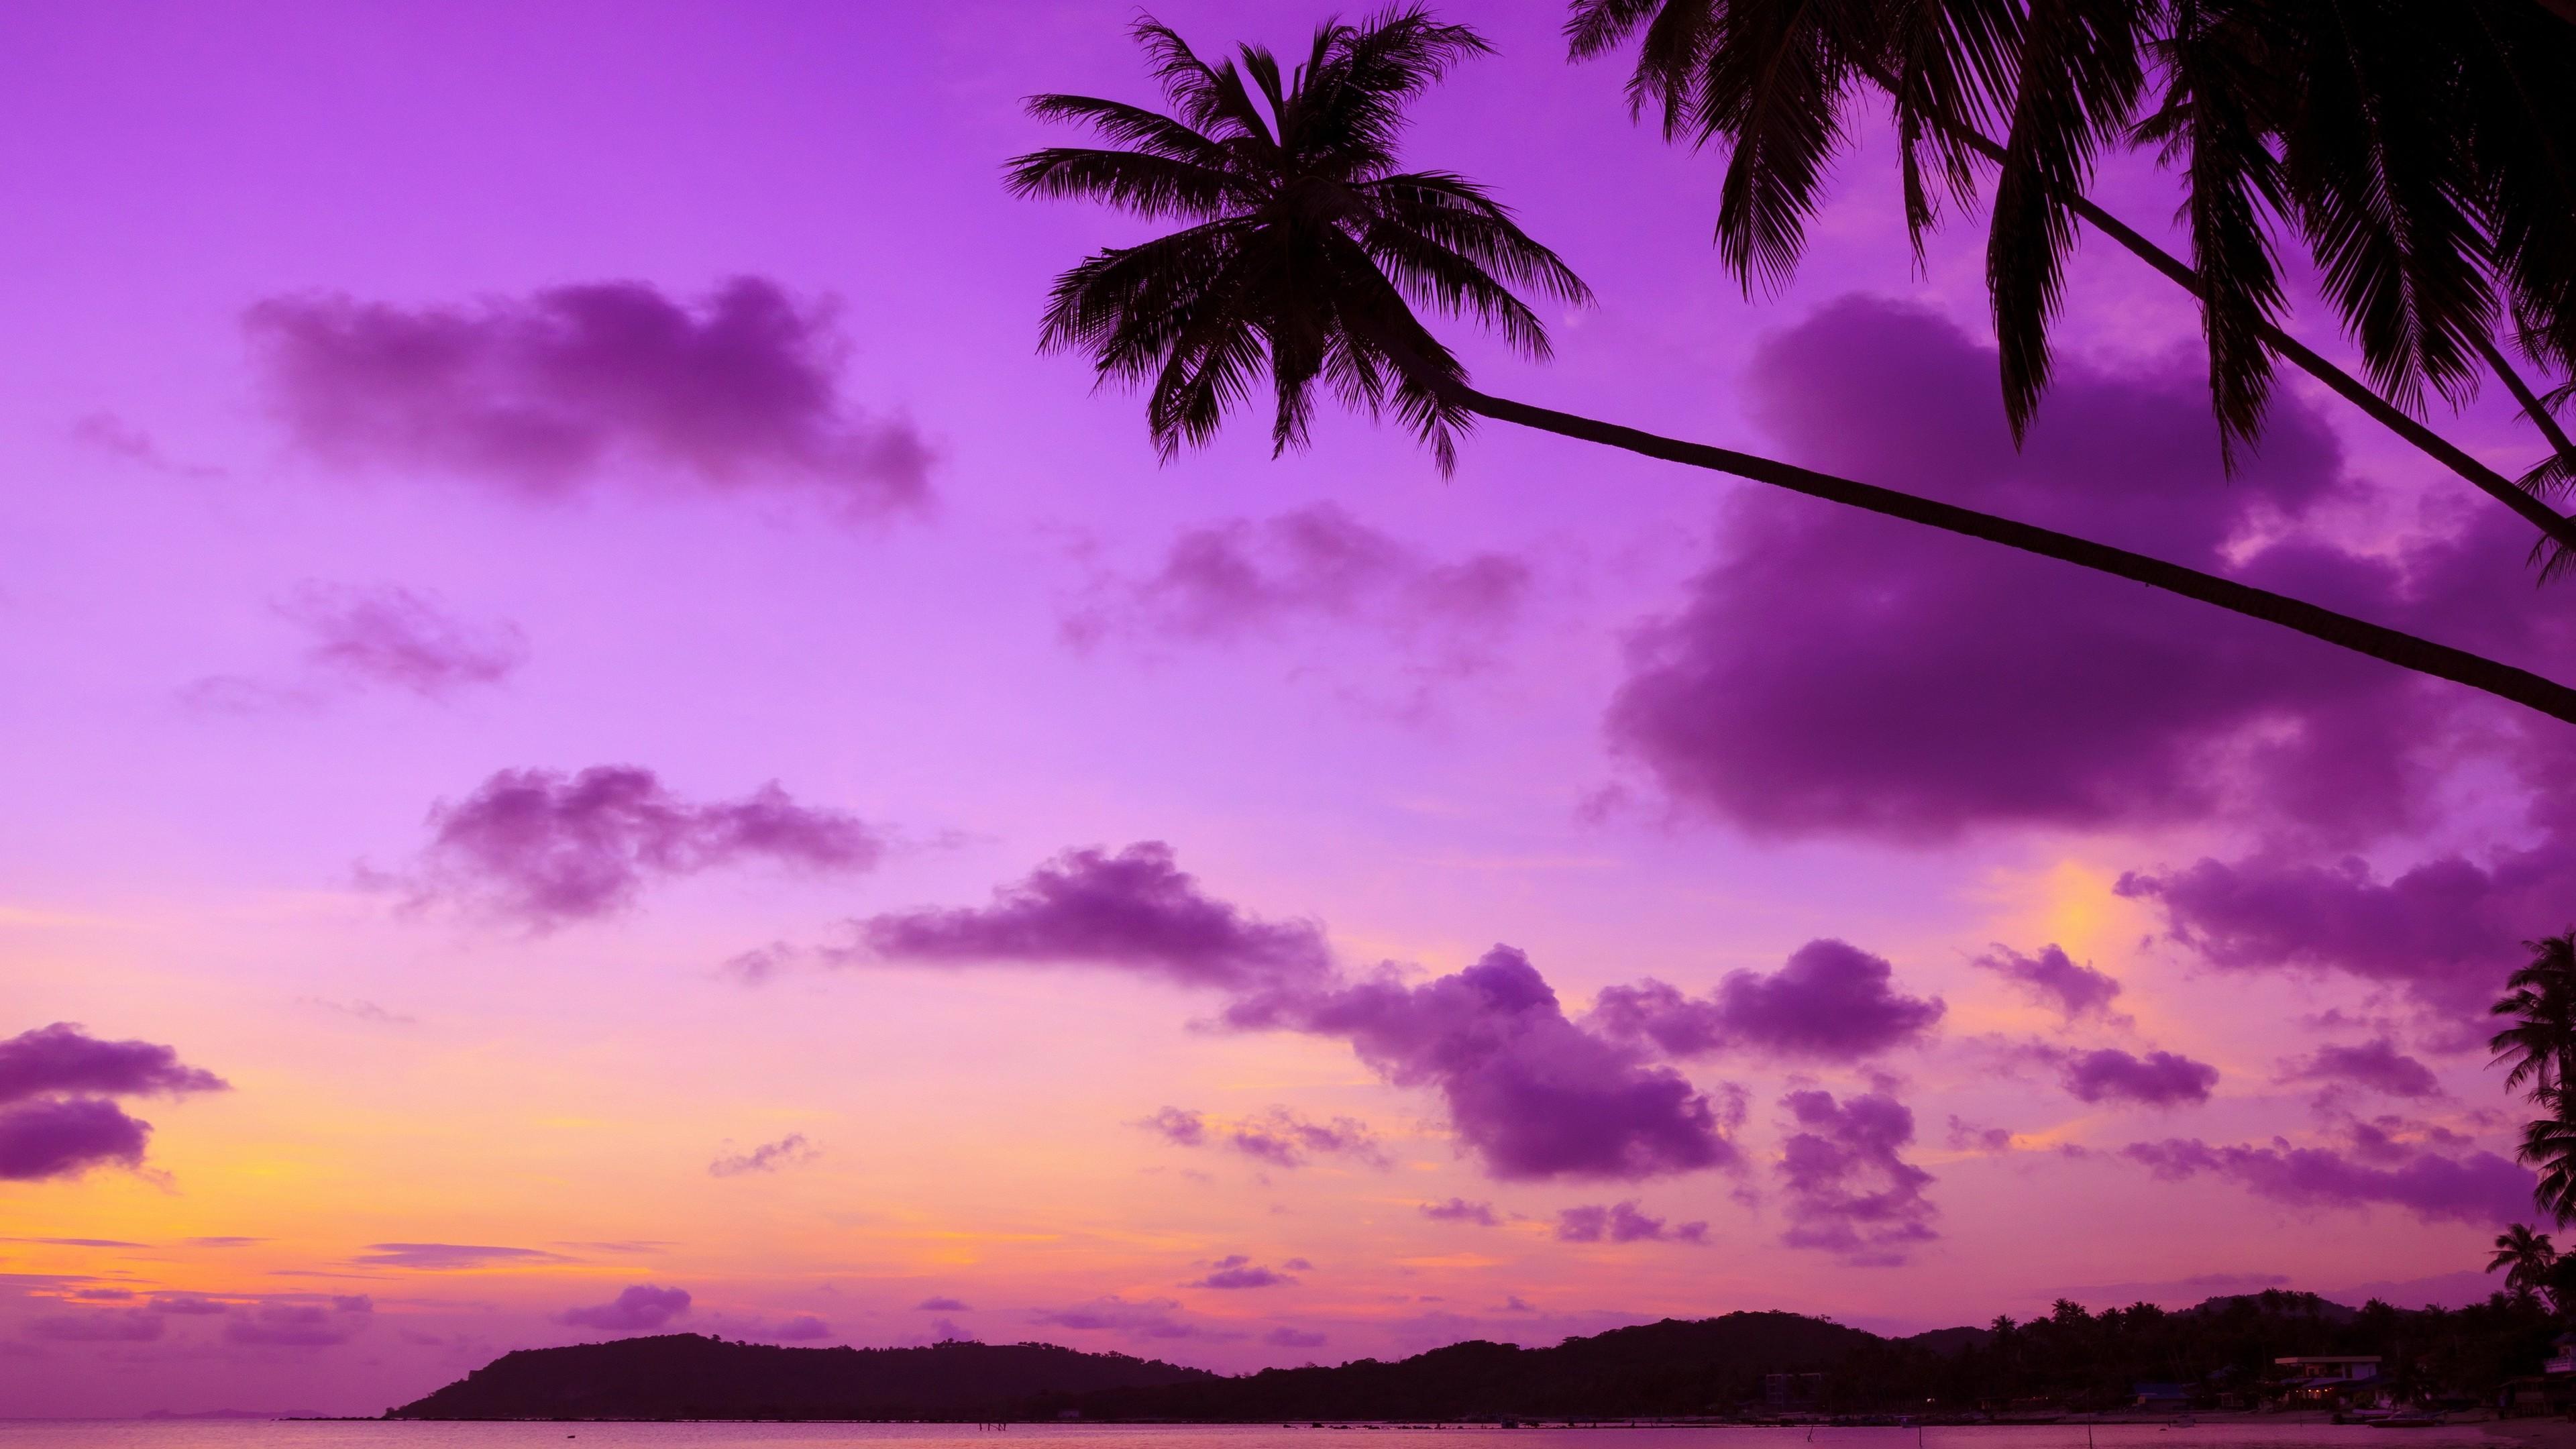 purple palm tree 4k 1540131528 - Purple Palm Tree 4k - trees wallpapers, purple wallpapers, palm wallpapers, nature wallpapers, hd-wallpapers